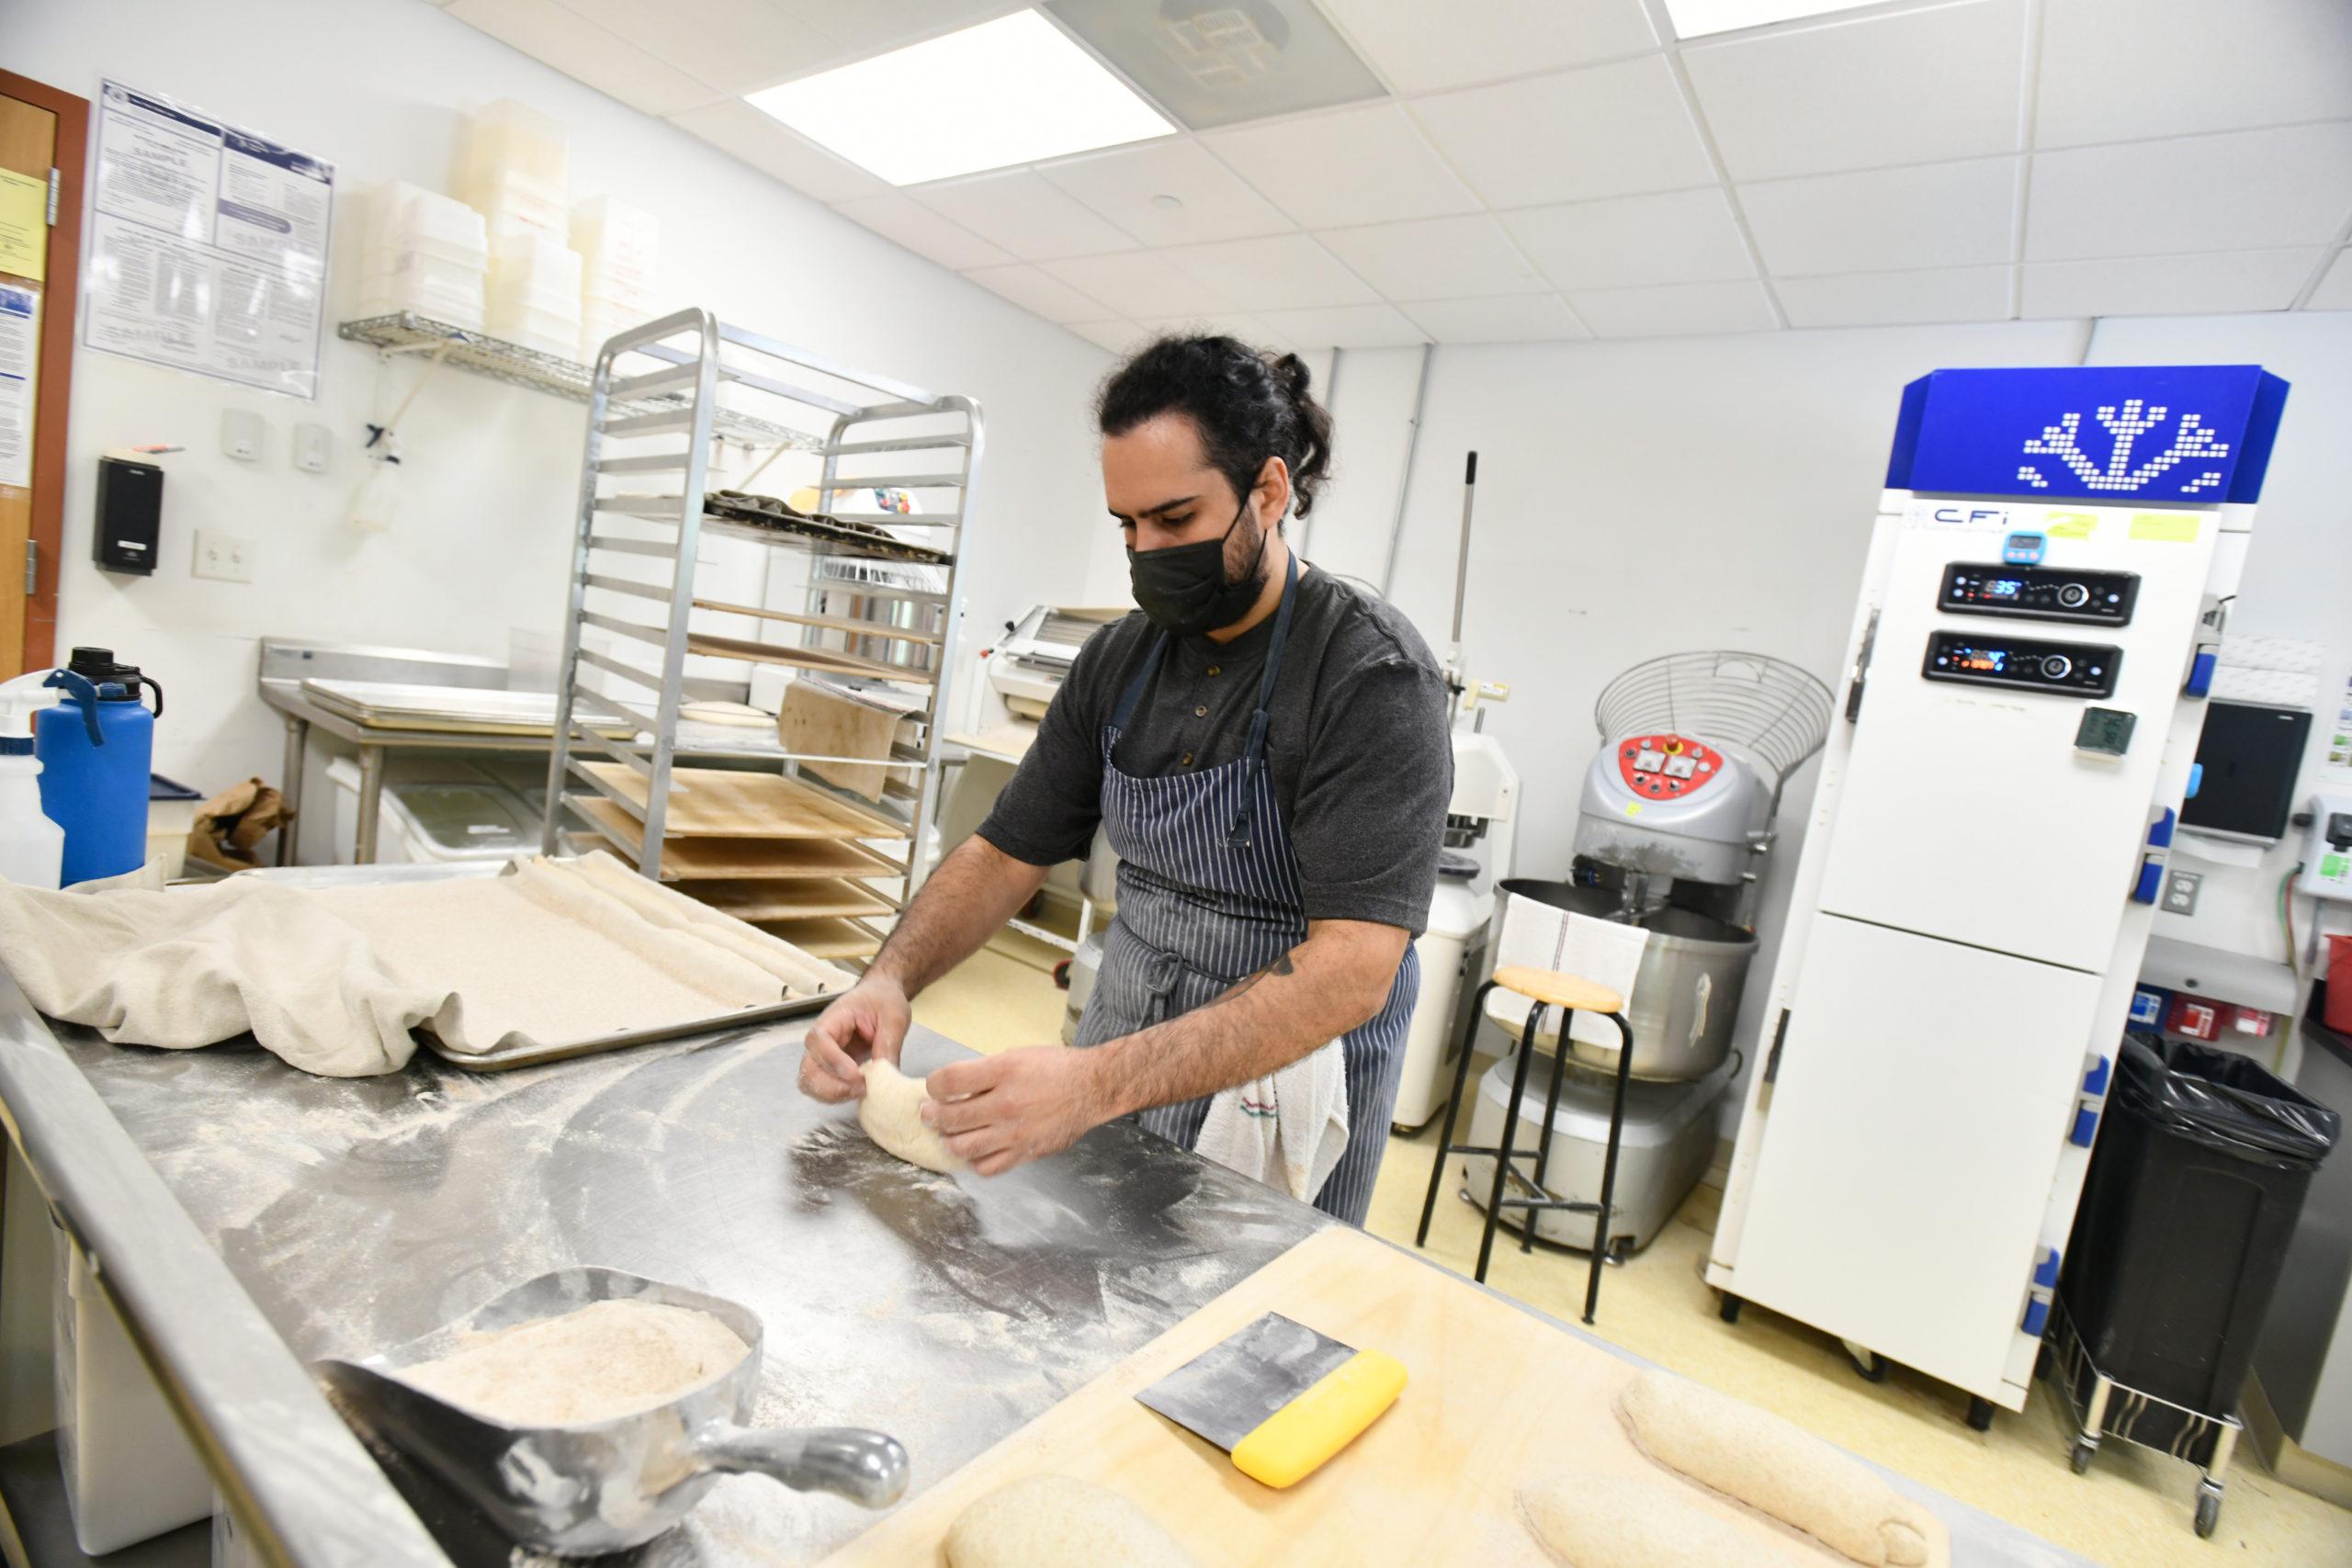 Chef Carlos Barbosa shapes loaves at the Newlight Breadworks kitchen in Calverton.  DANA SHAW